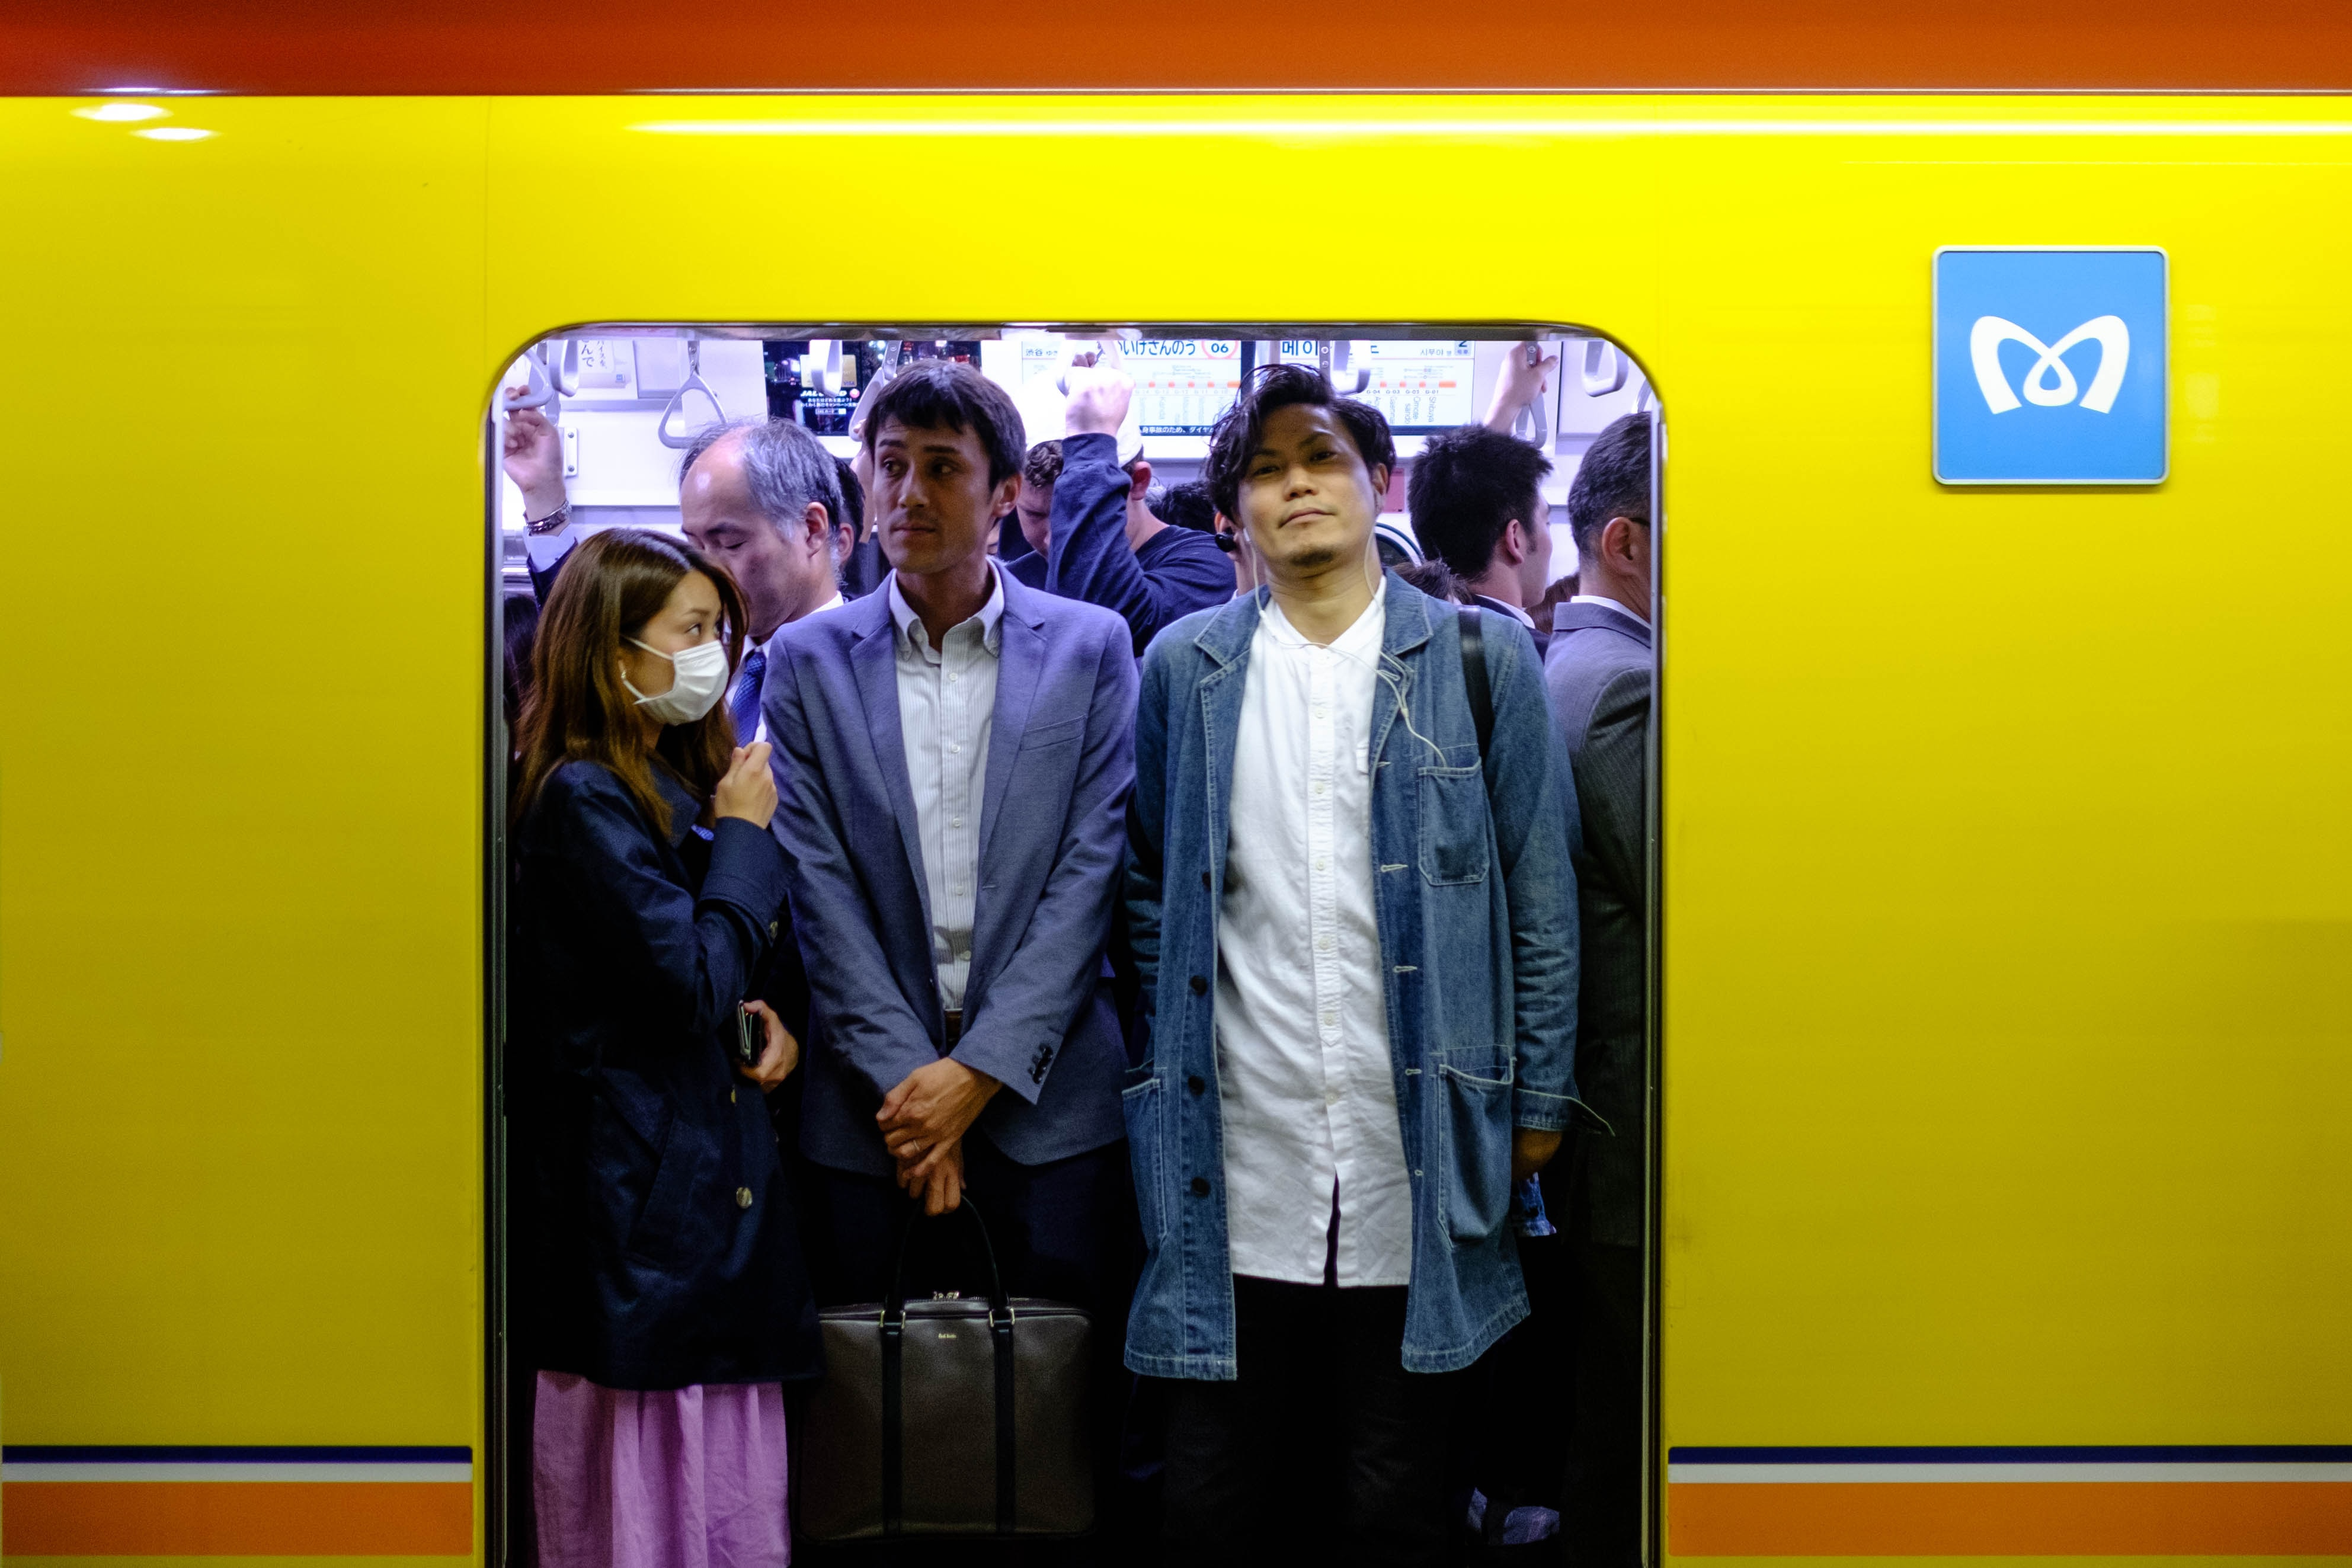 jam-packed-train